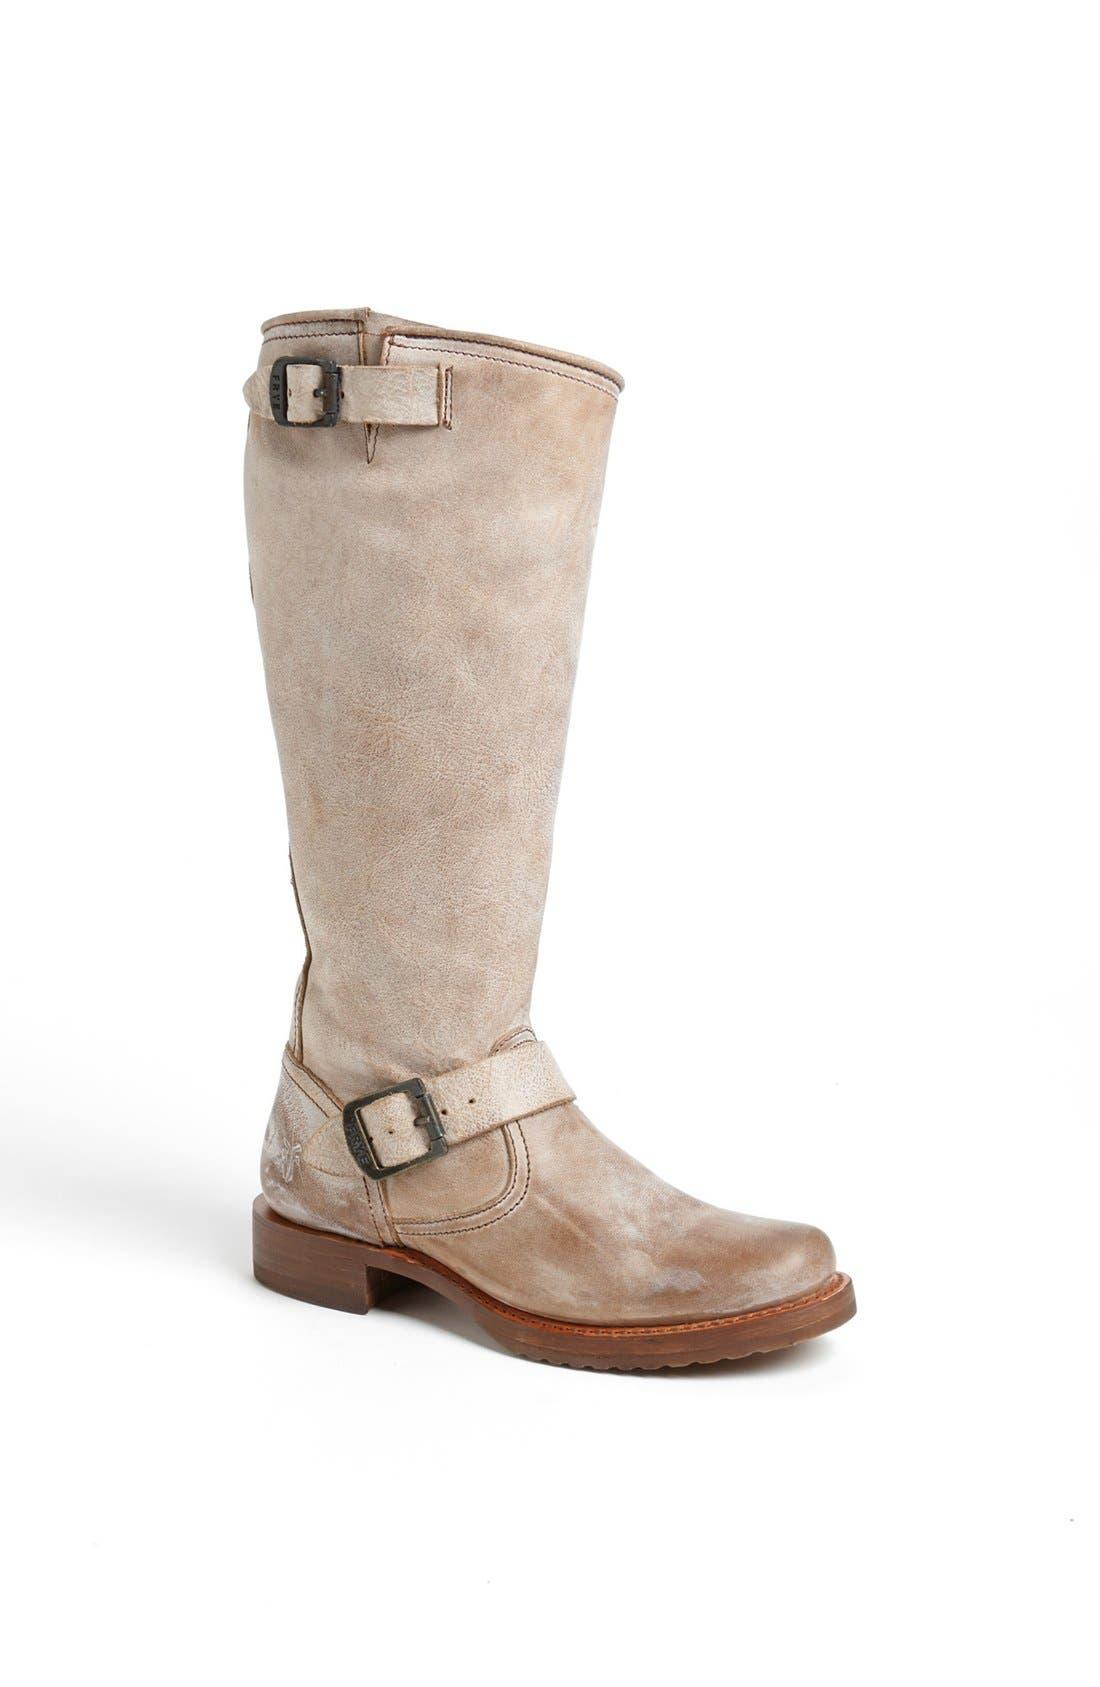 Main Image - Frye 'Veronica Slouch' Boot (Regular & Wide Calf) (Women)